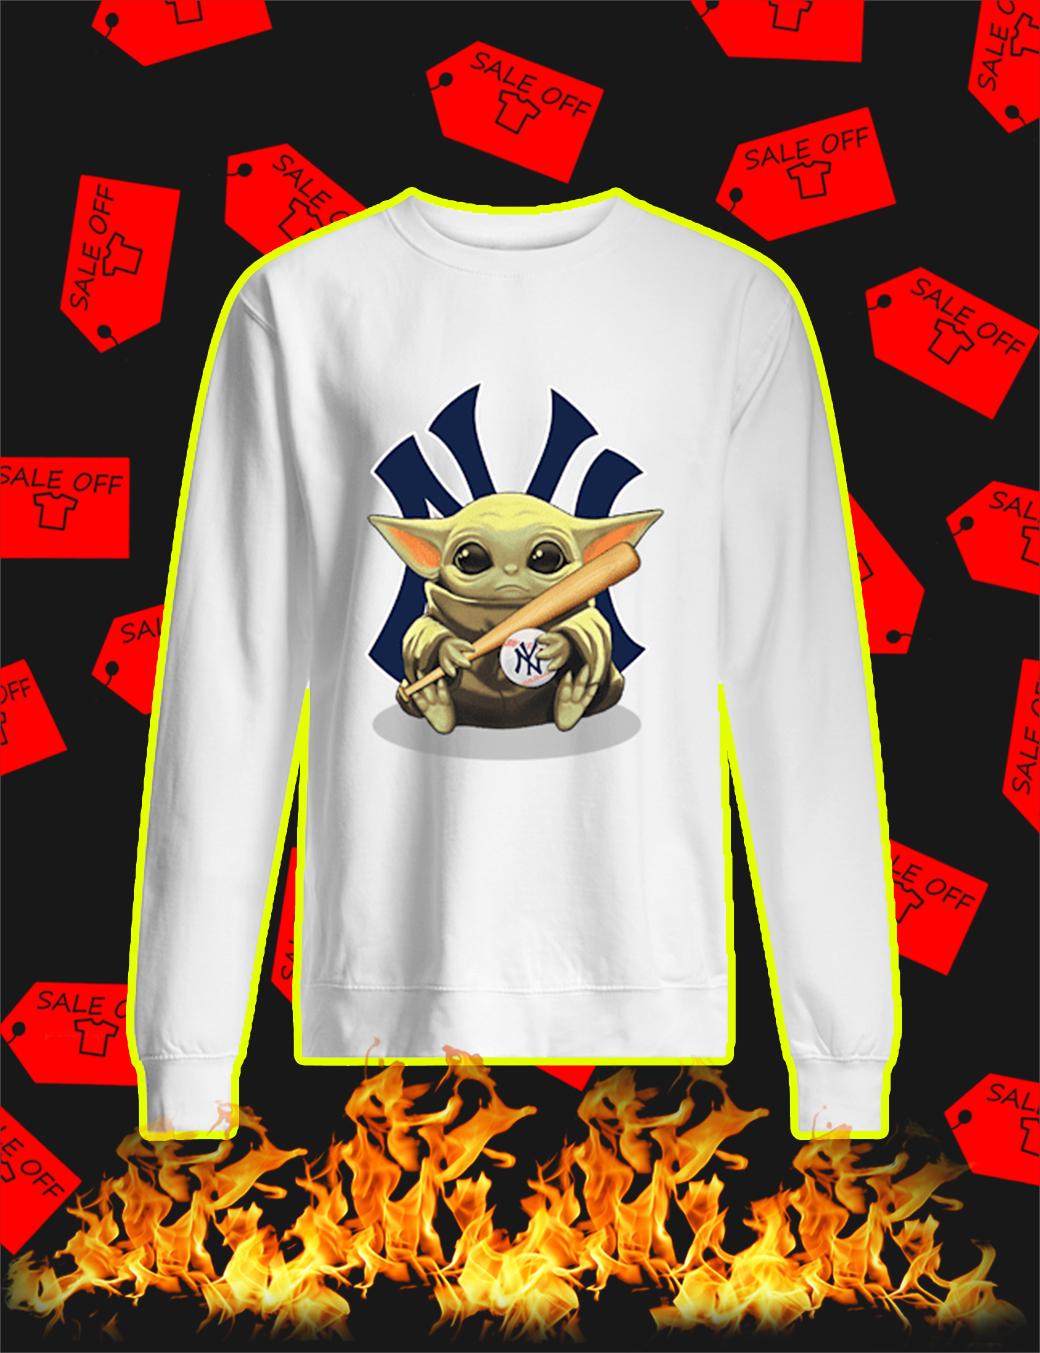 sale off baby yoda hug new york yankees shirt and vneck